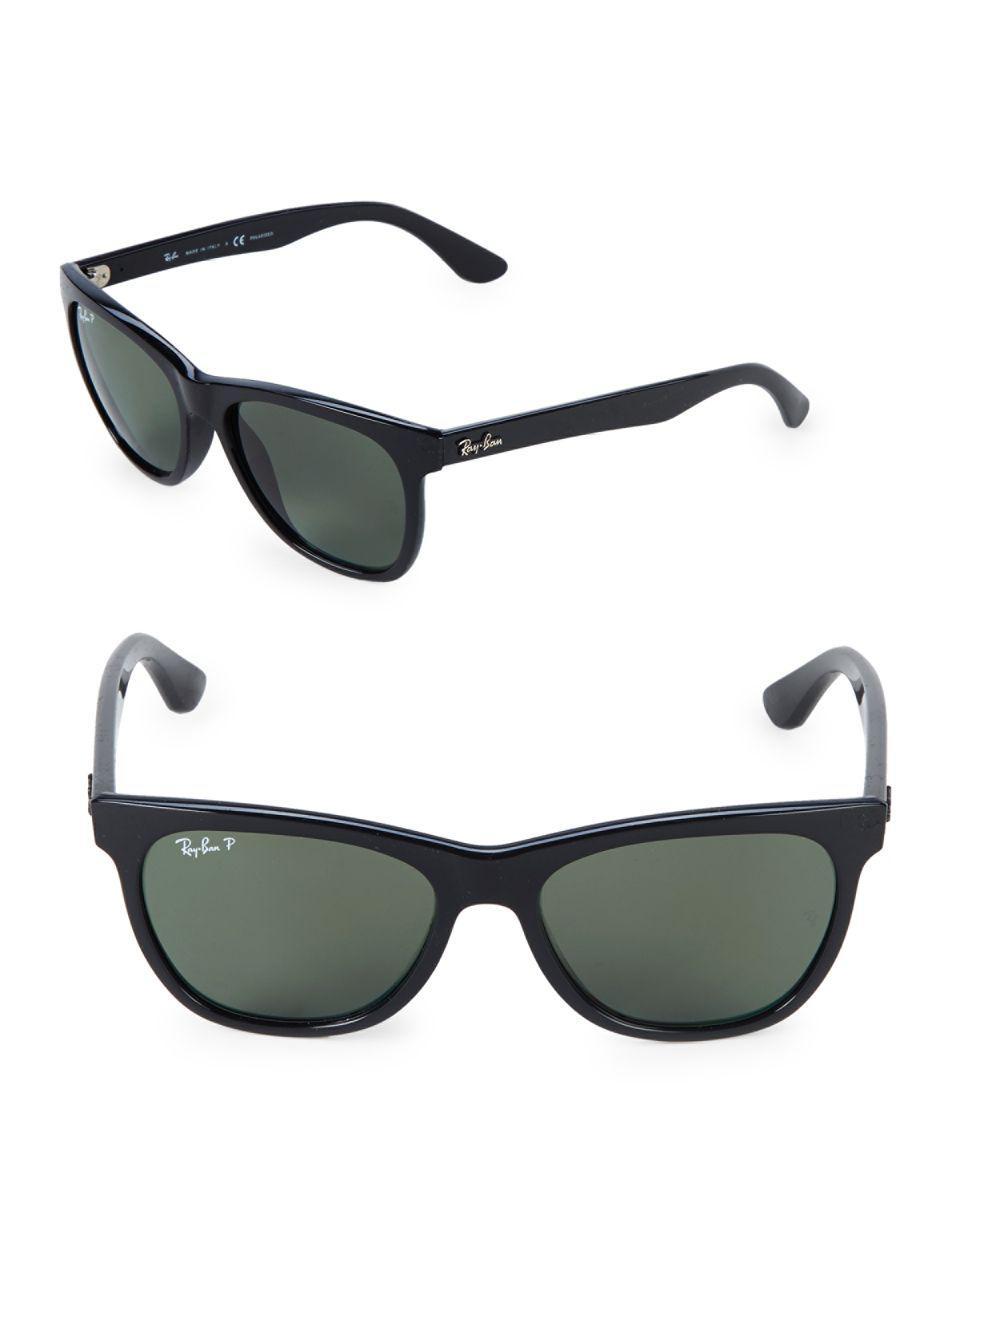 3ea0cca854128 Ray-Ban 54mm Polarized Wayfarer Sunglasses in Black for Men - Lyst